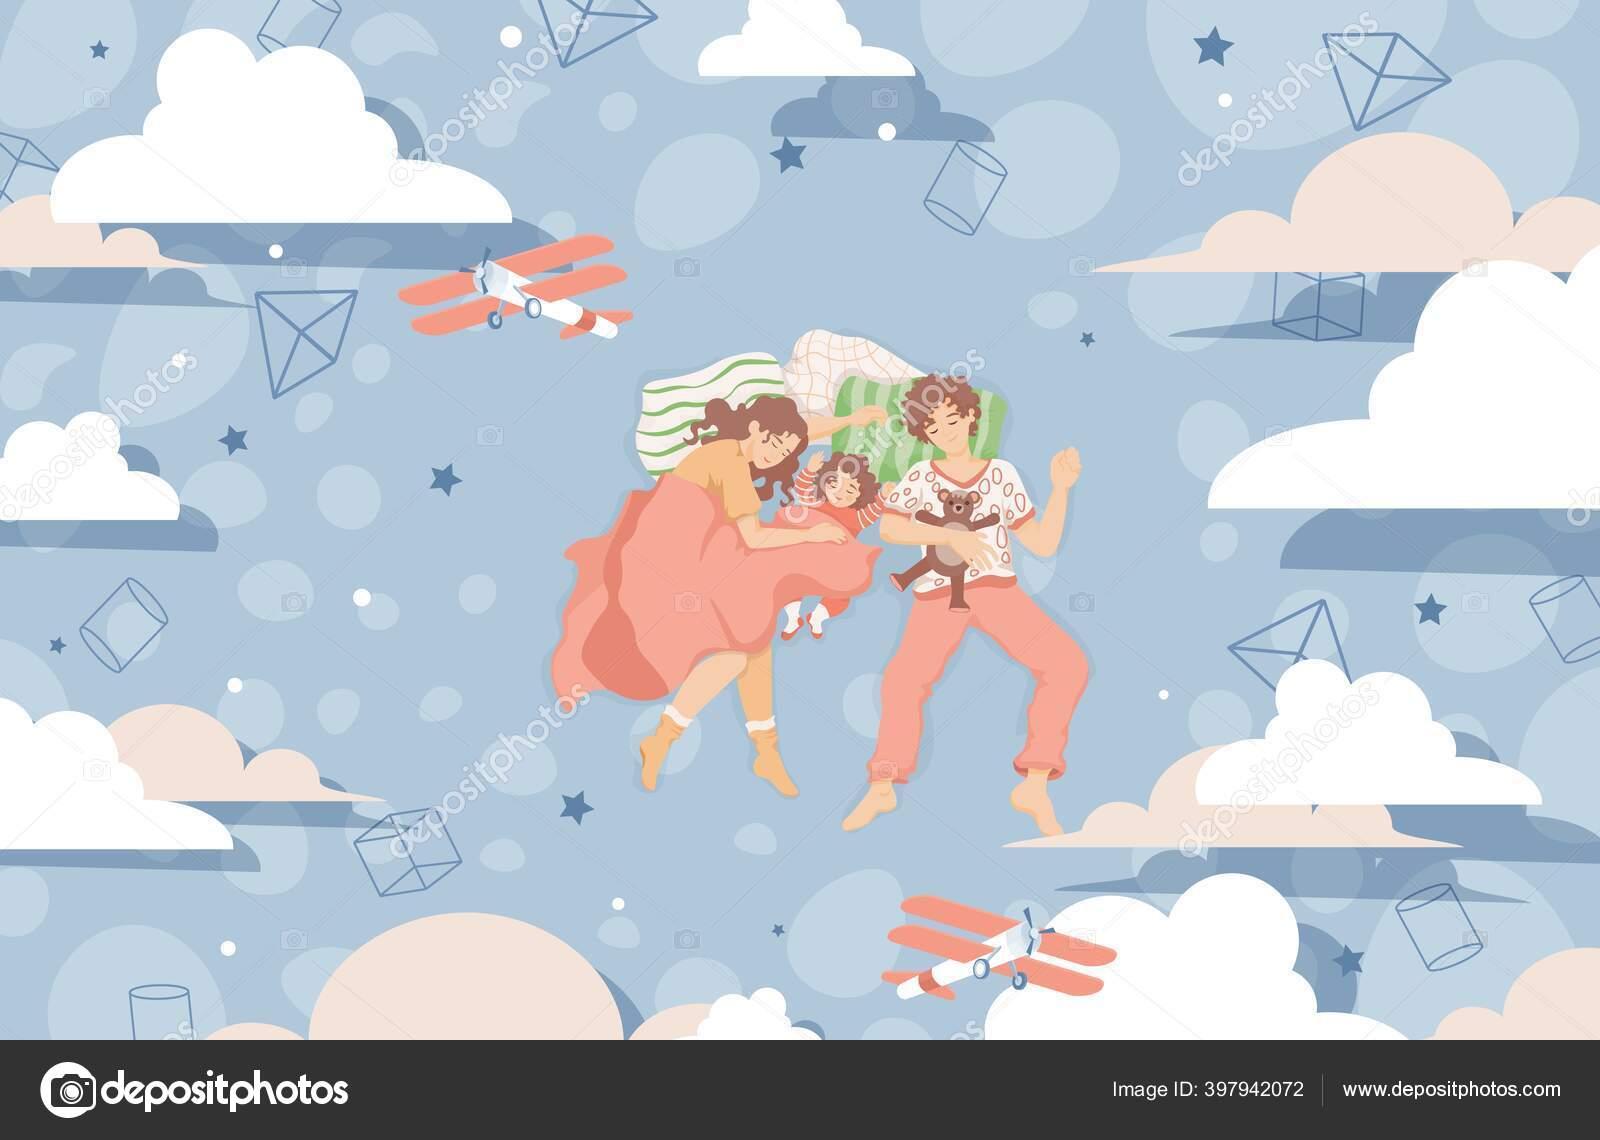 Keluarga Tidur Bersama Di Tempat Tidur Dan Bermimpi Vektor Datar Ilustrasi Keluarga Bahagia Menghabiskan Waktu Bersama Stok Vektor C Plahotya 397942072